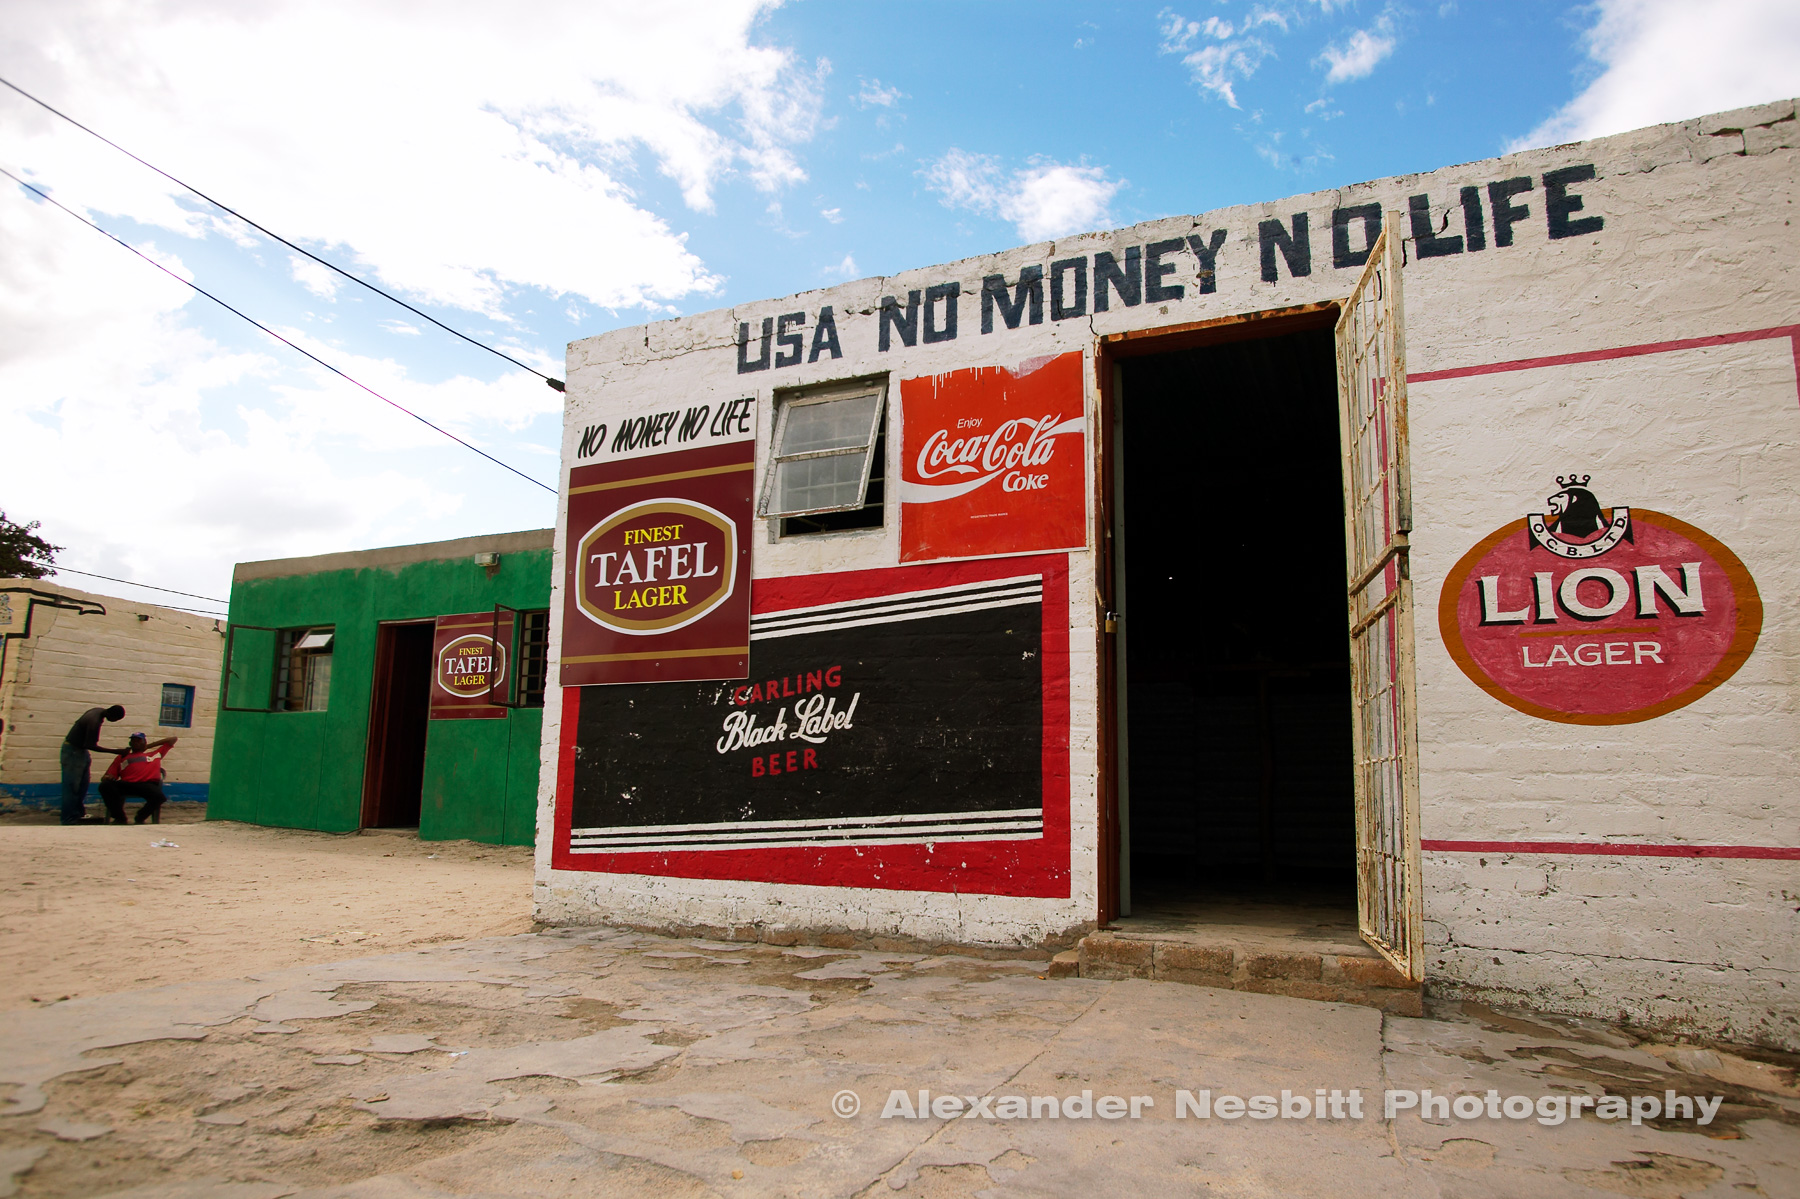 Africa, Namibia 2004 - USA No Money, No Life. Bar in Namibia.